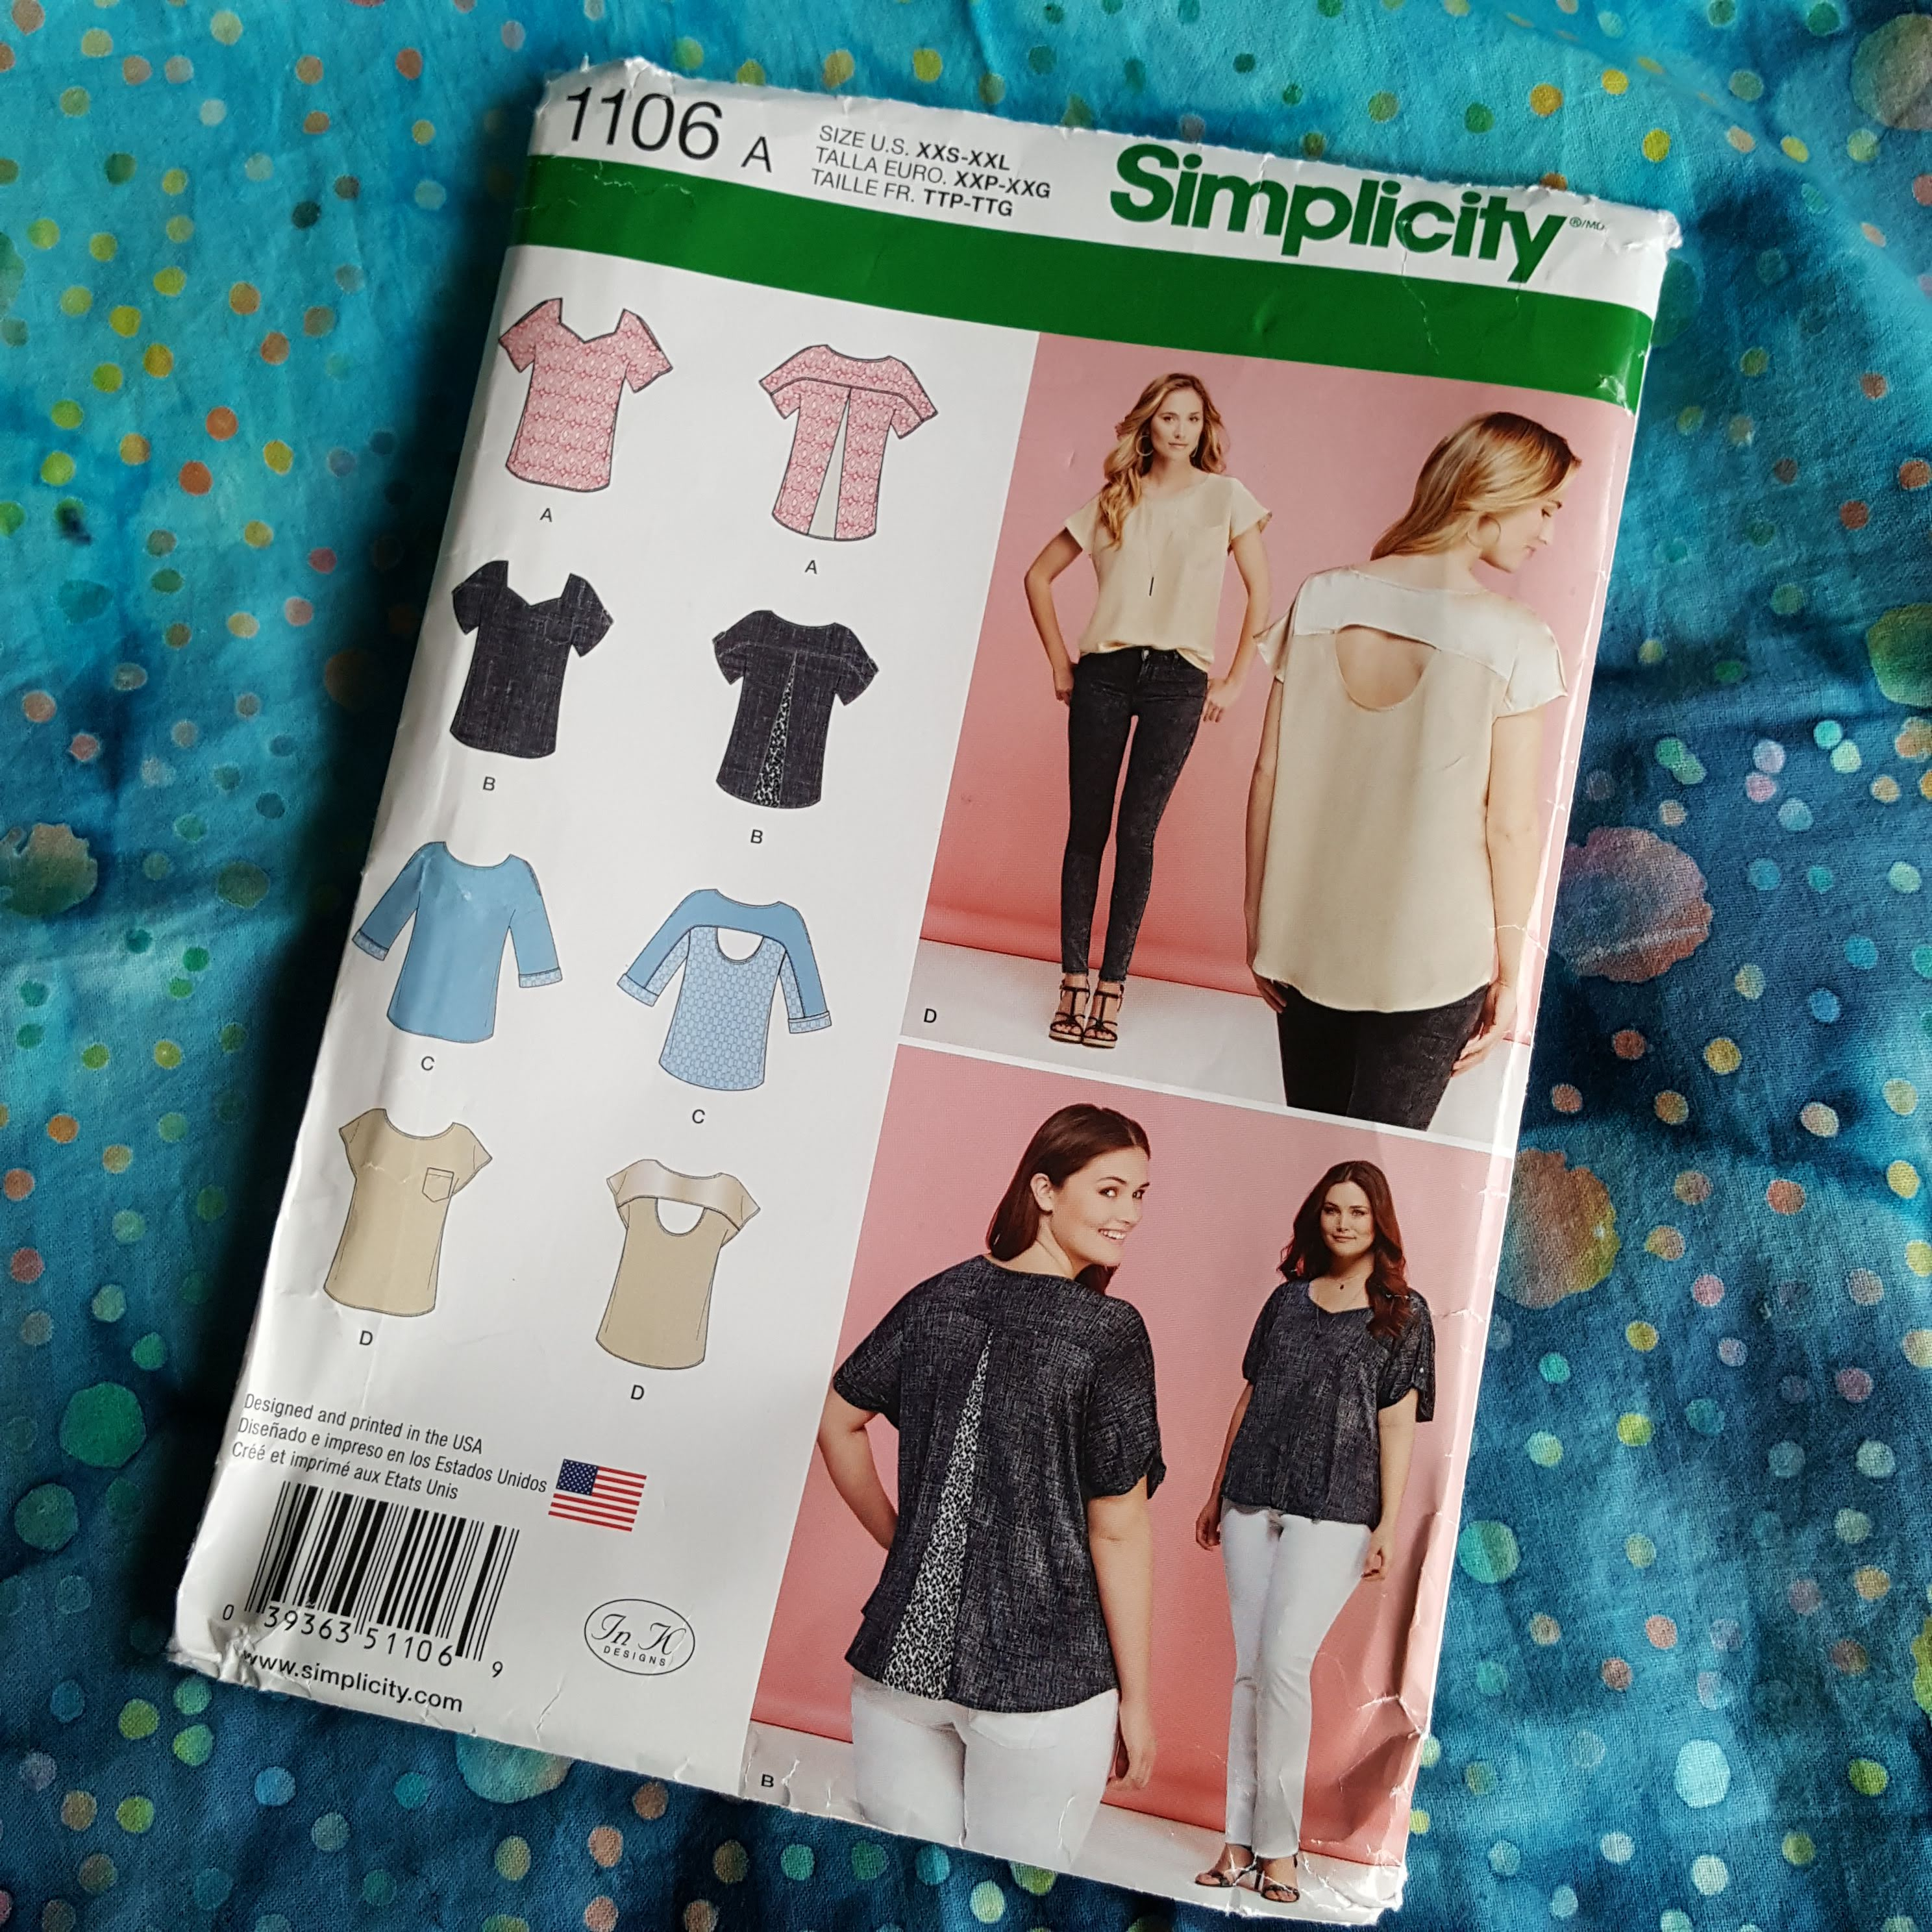 Simplicity 1106 pattern